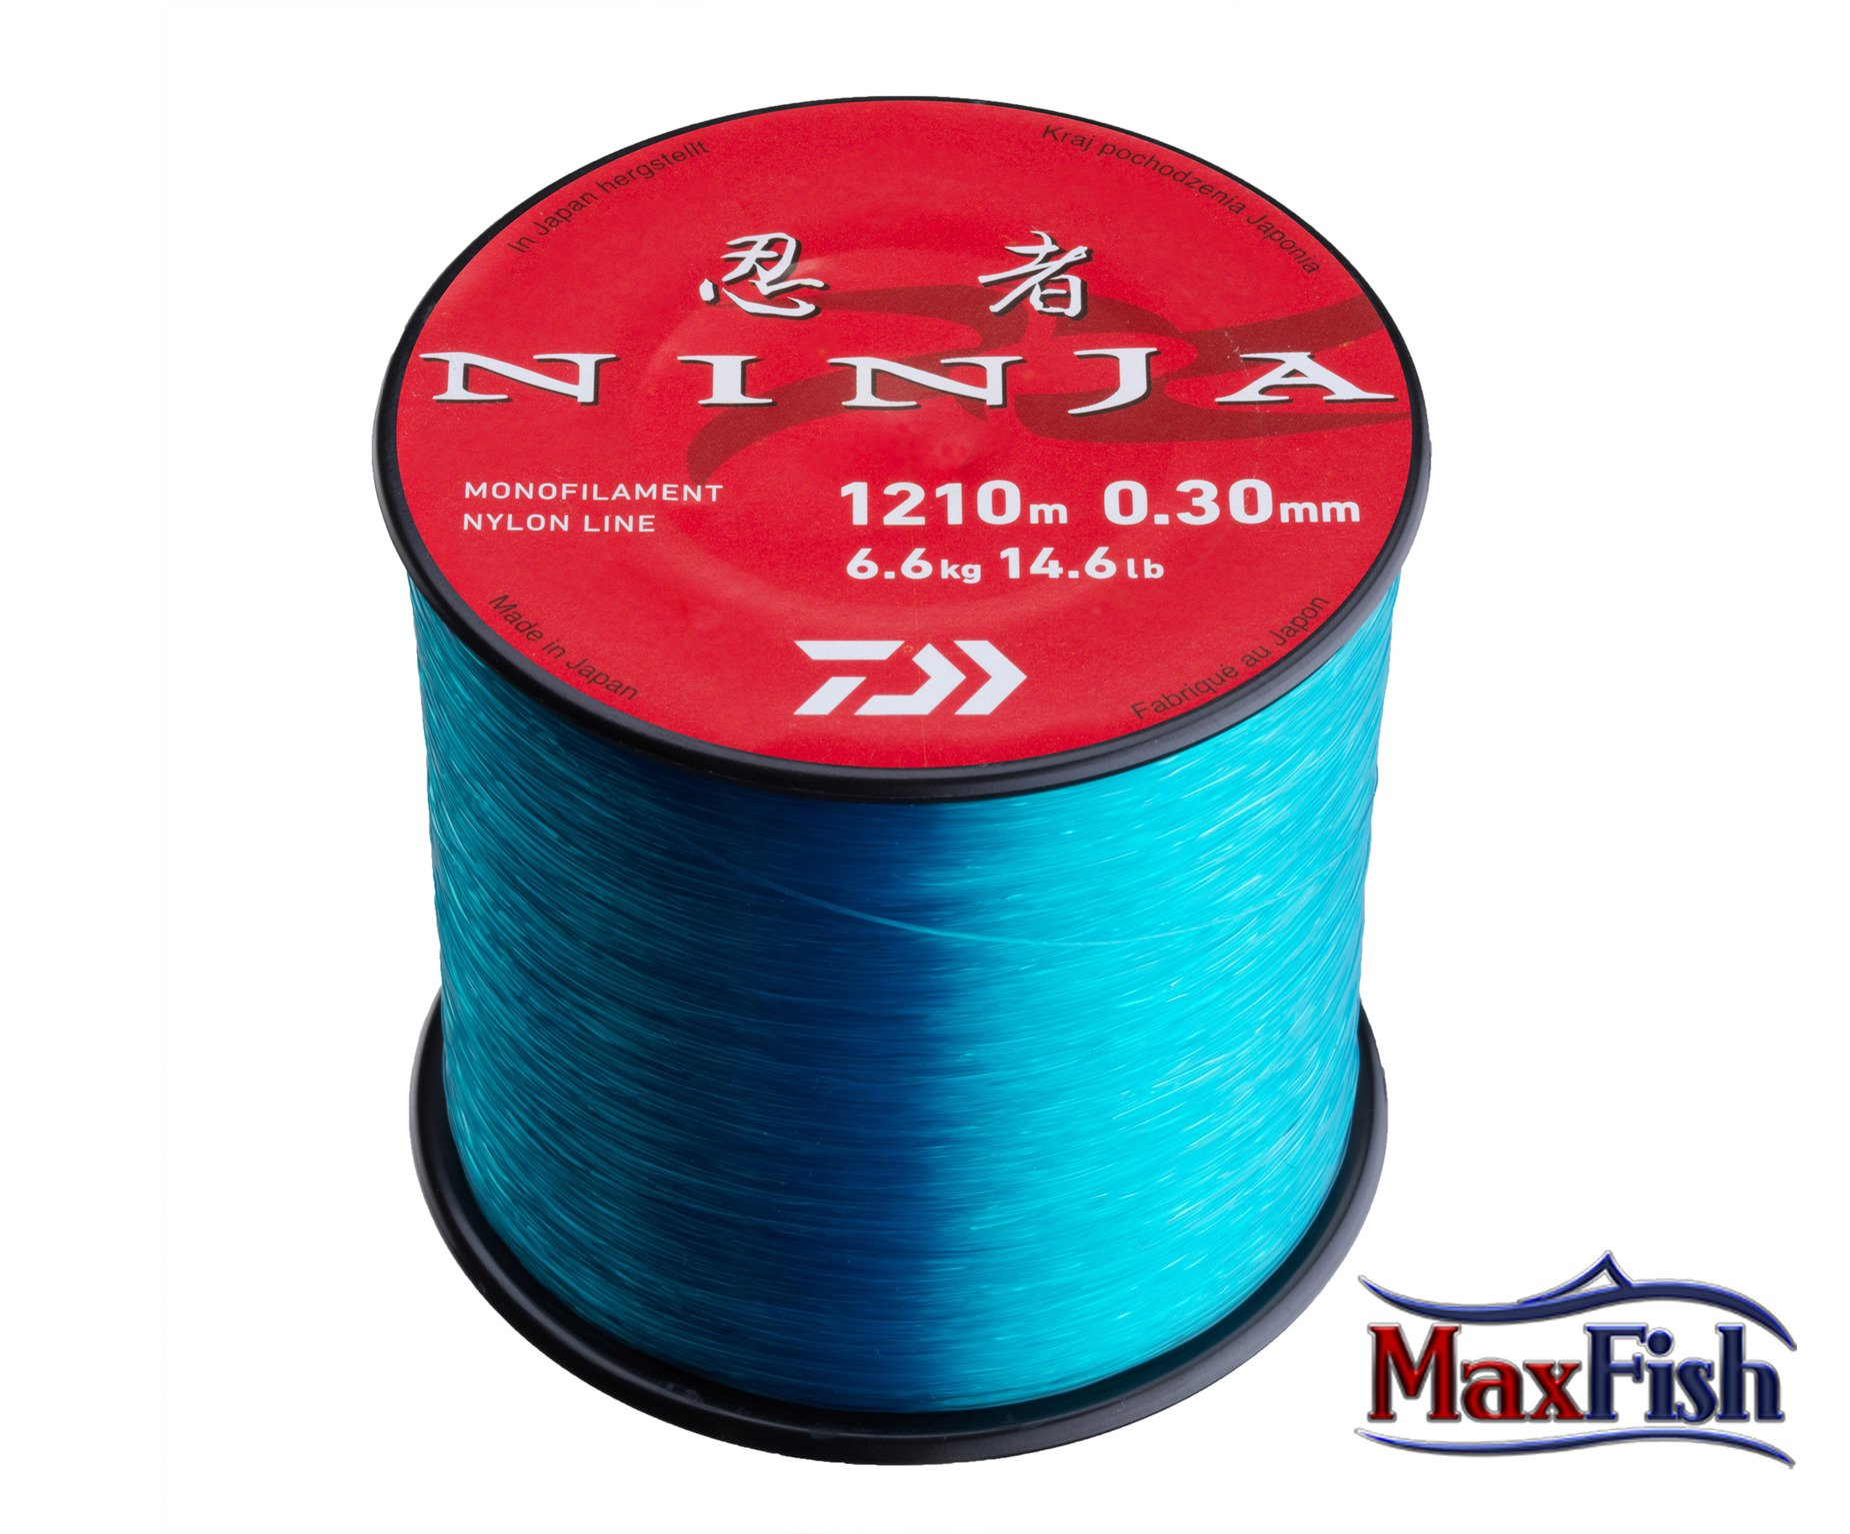 Daiwa ¯y³ka Ninja X Mono - 3000m 0.18mm 2.5kg